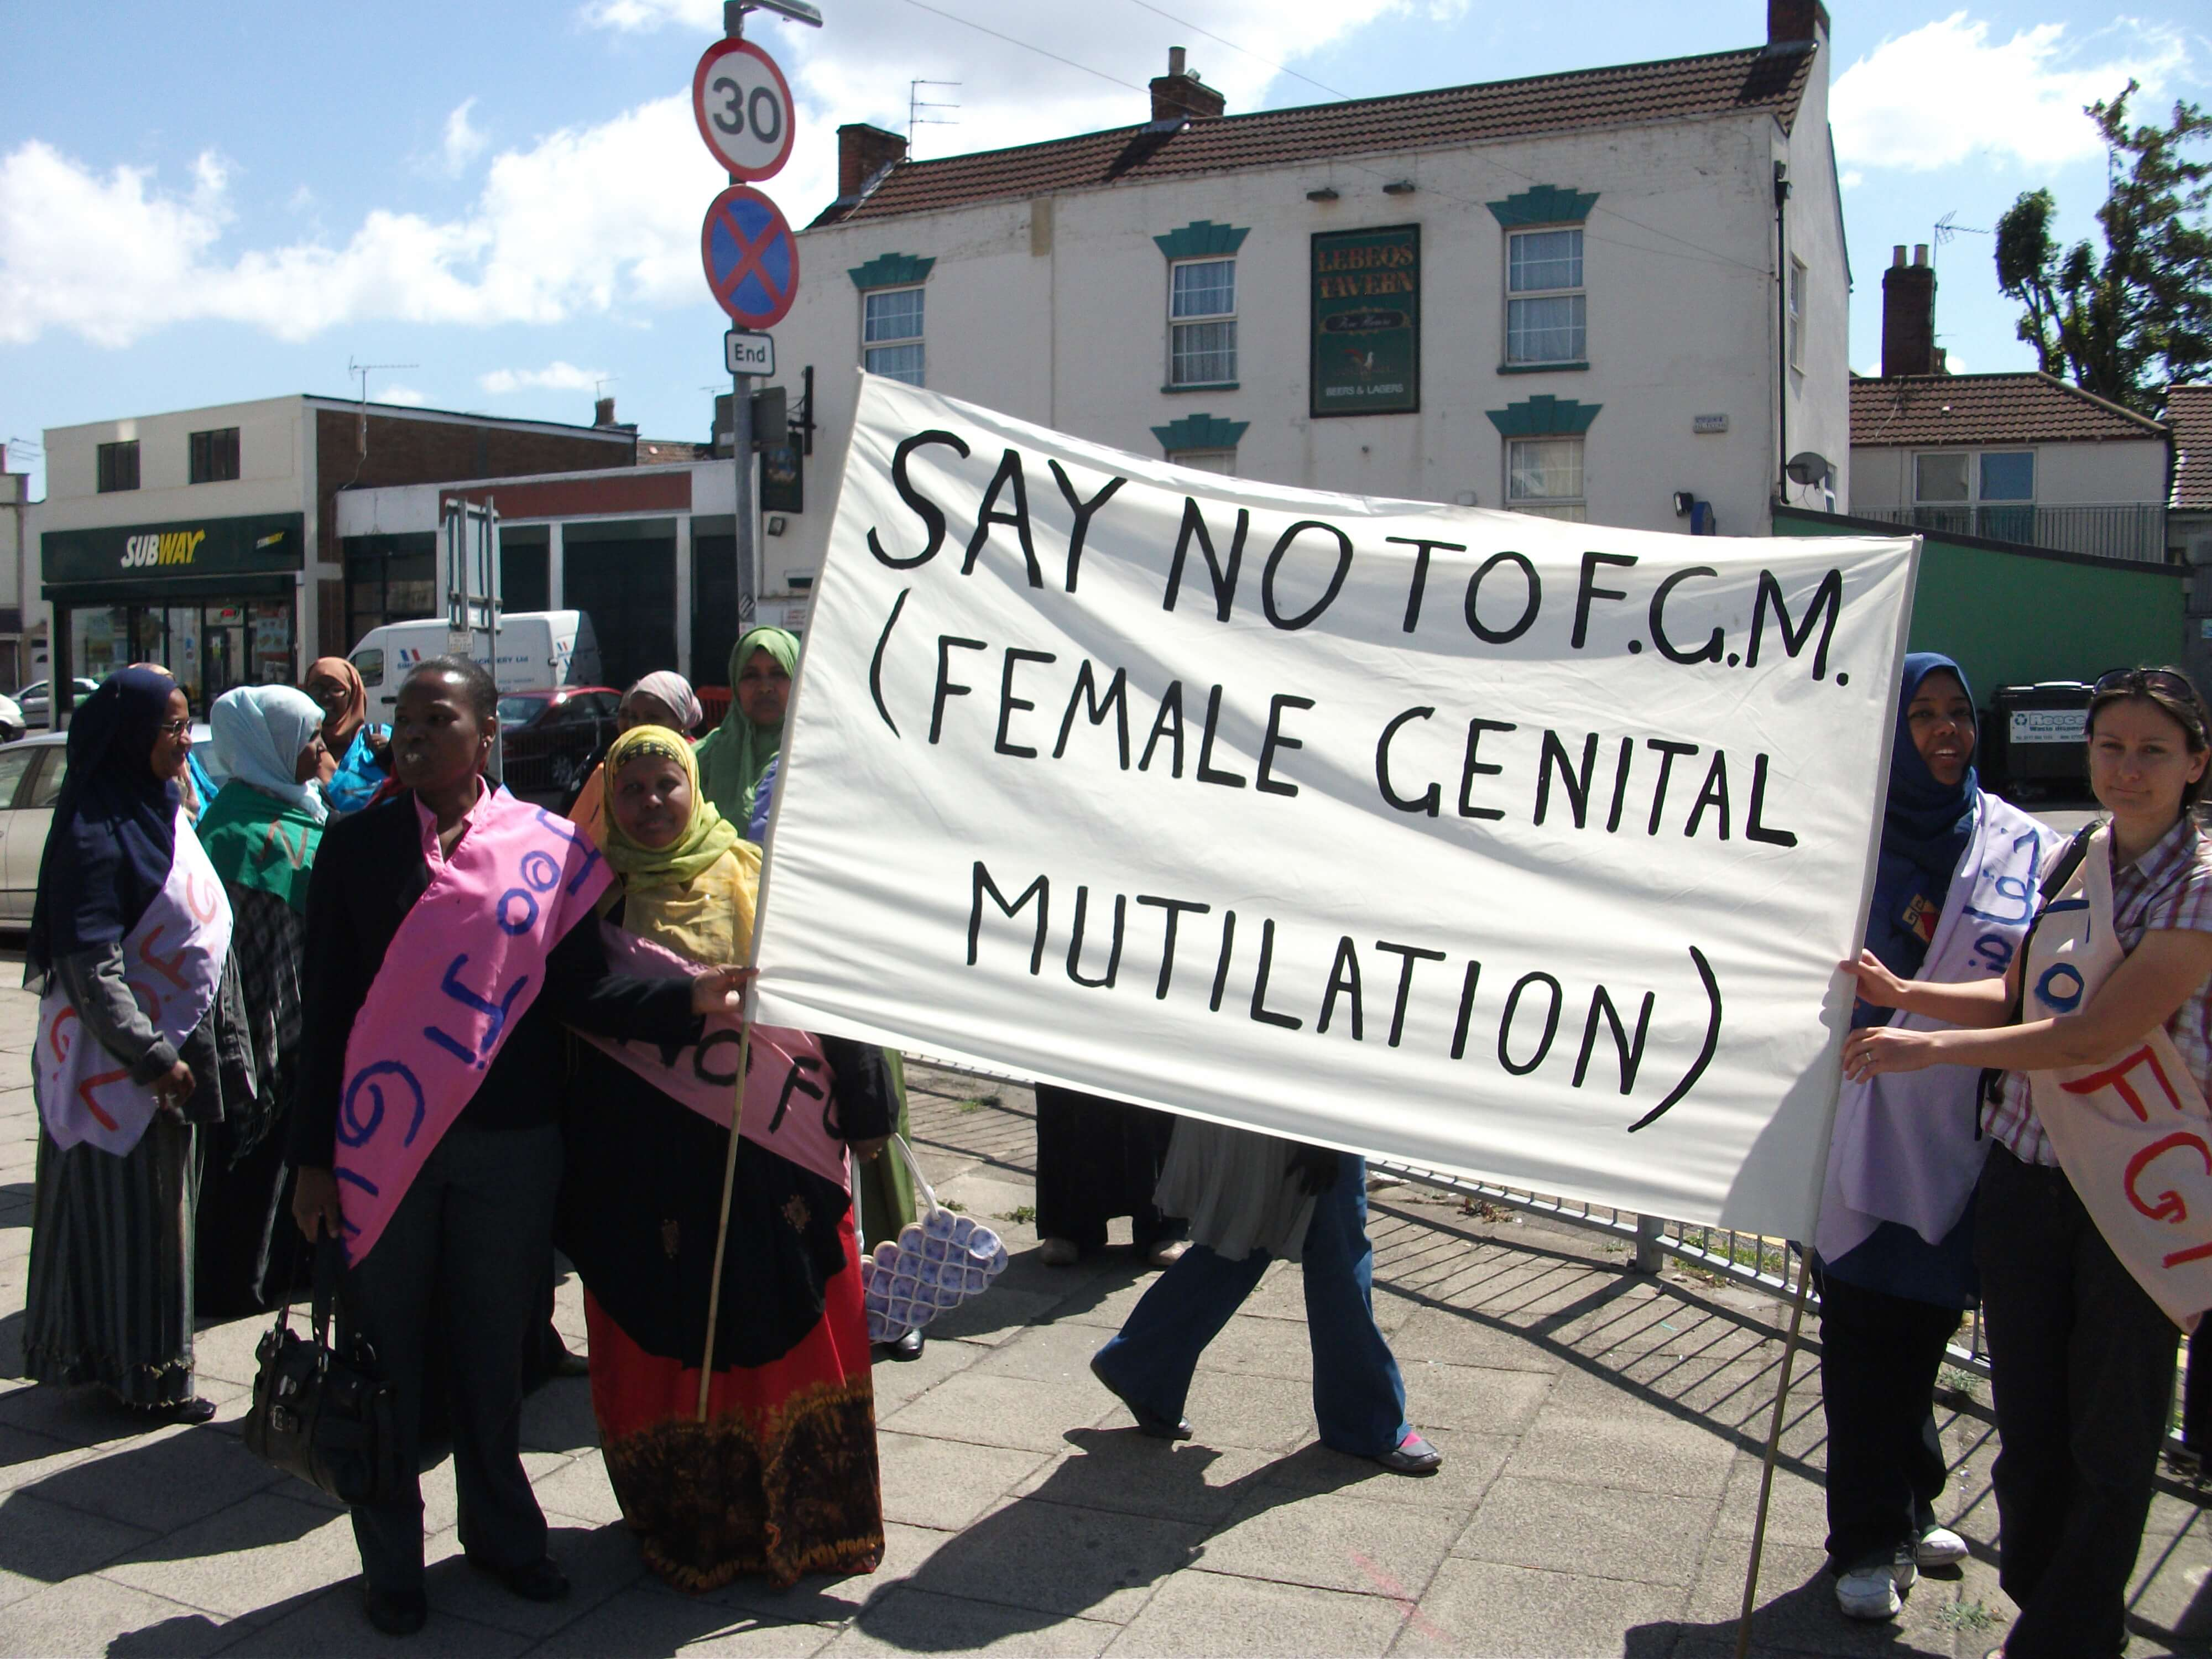 EU Positions on Millennium Development Goals Should Address Human Rights Violations